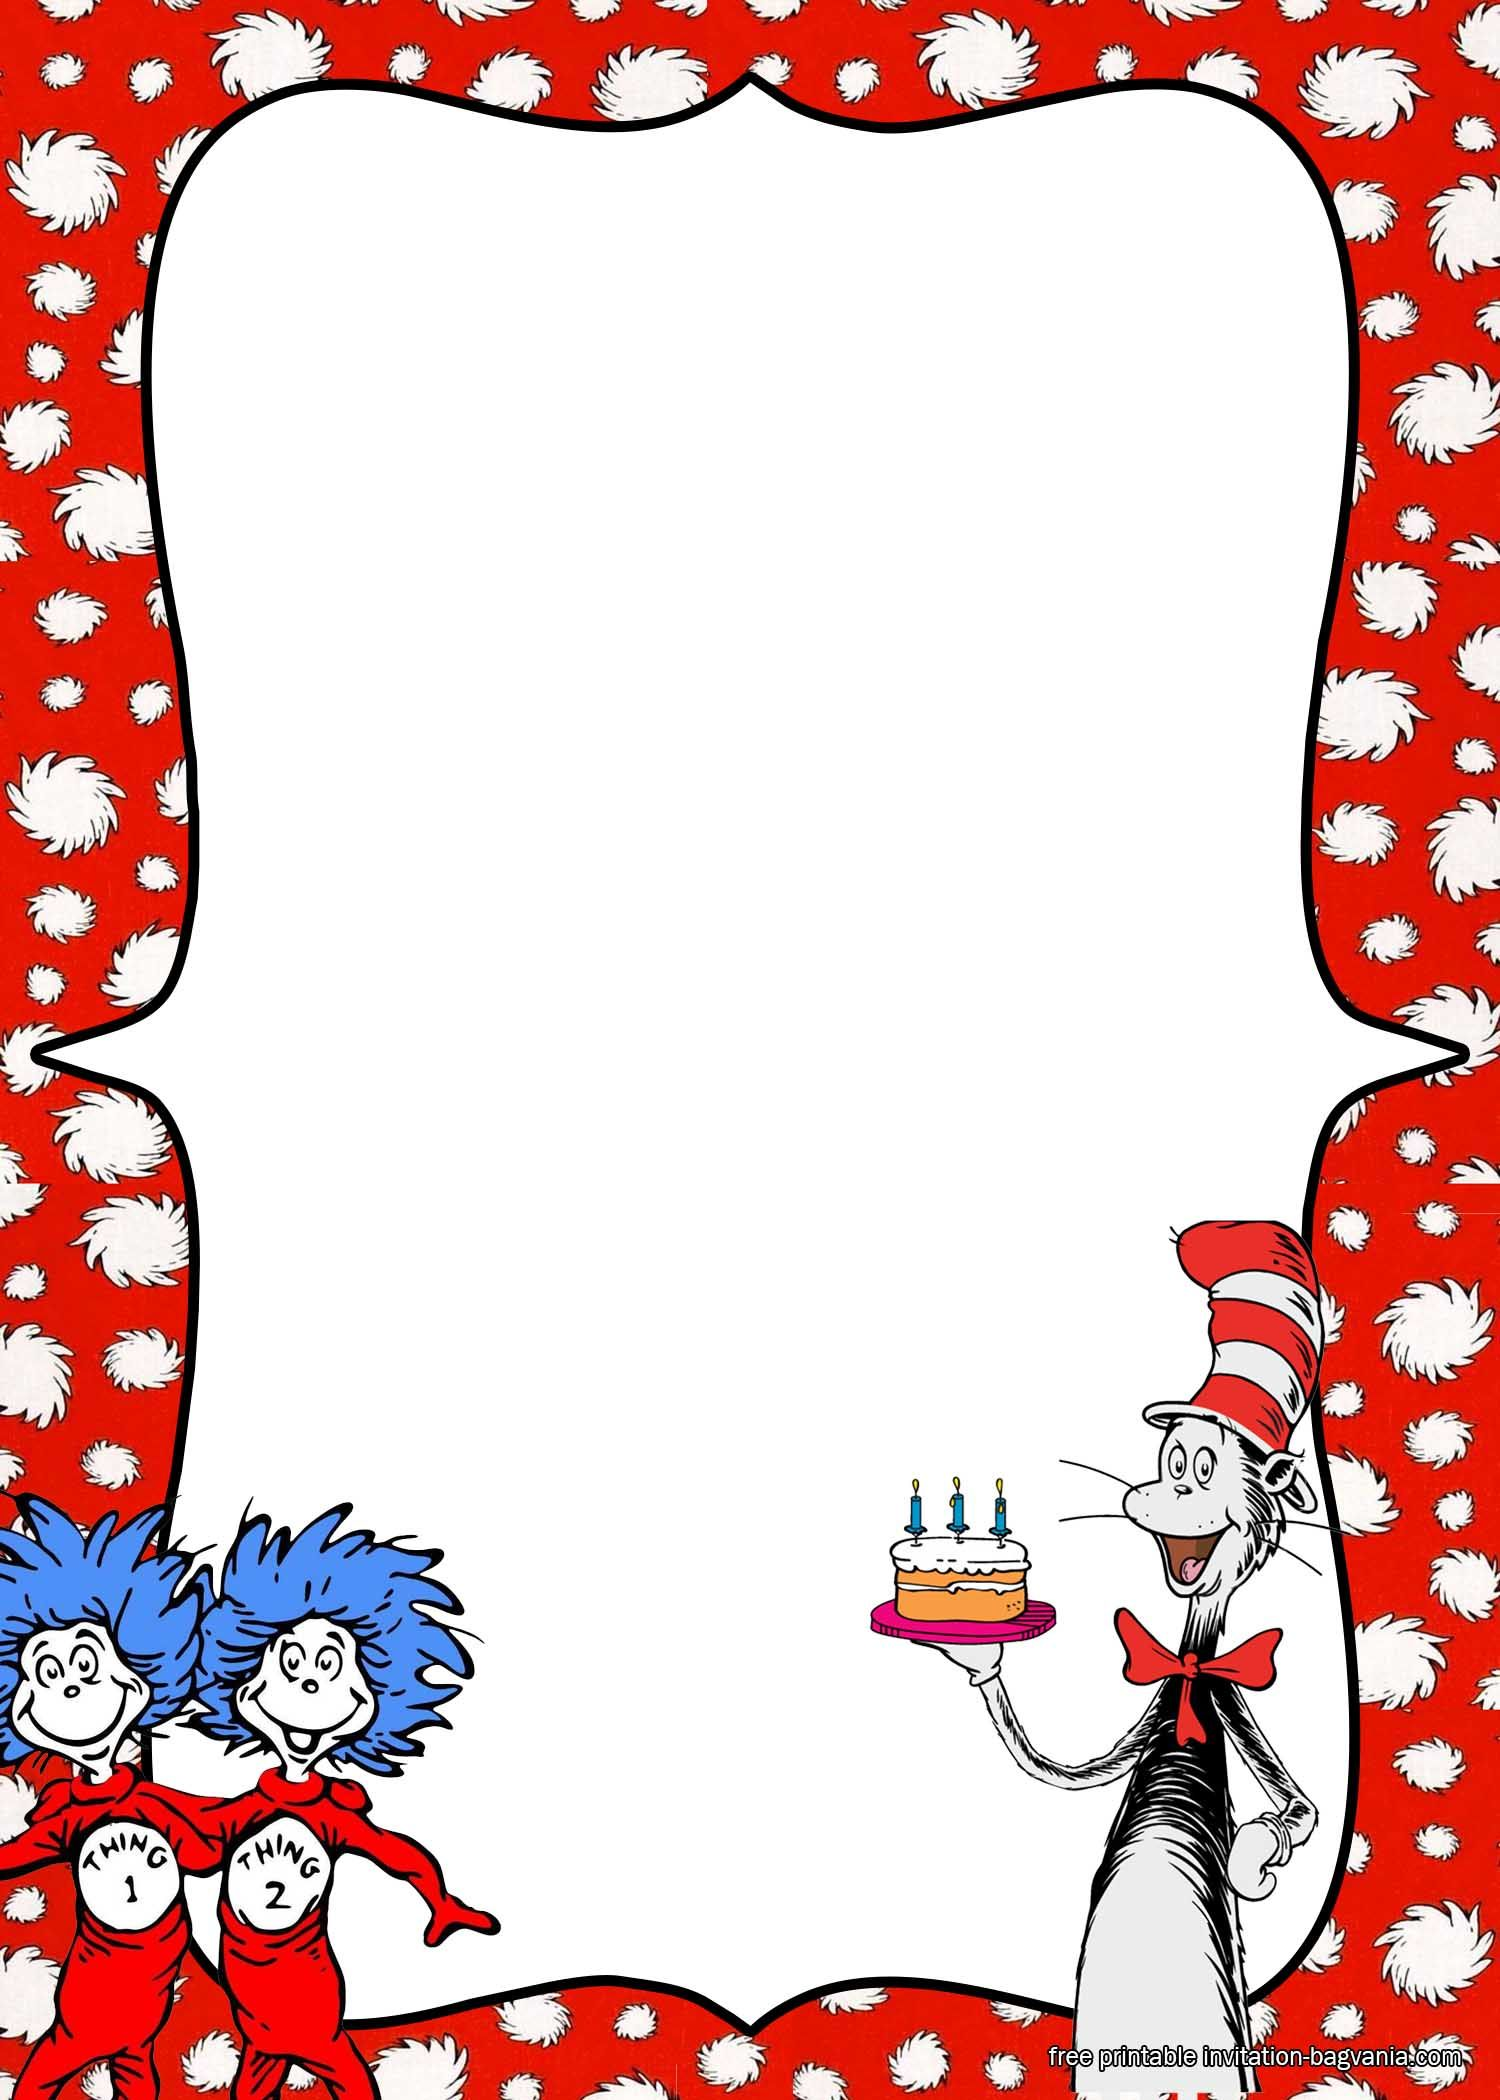 Free Printable Dr Seuss Birthday Invitation Templates Dr Seuss Invitations Dr Seuss Birthday Dr Seuss Crafts